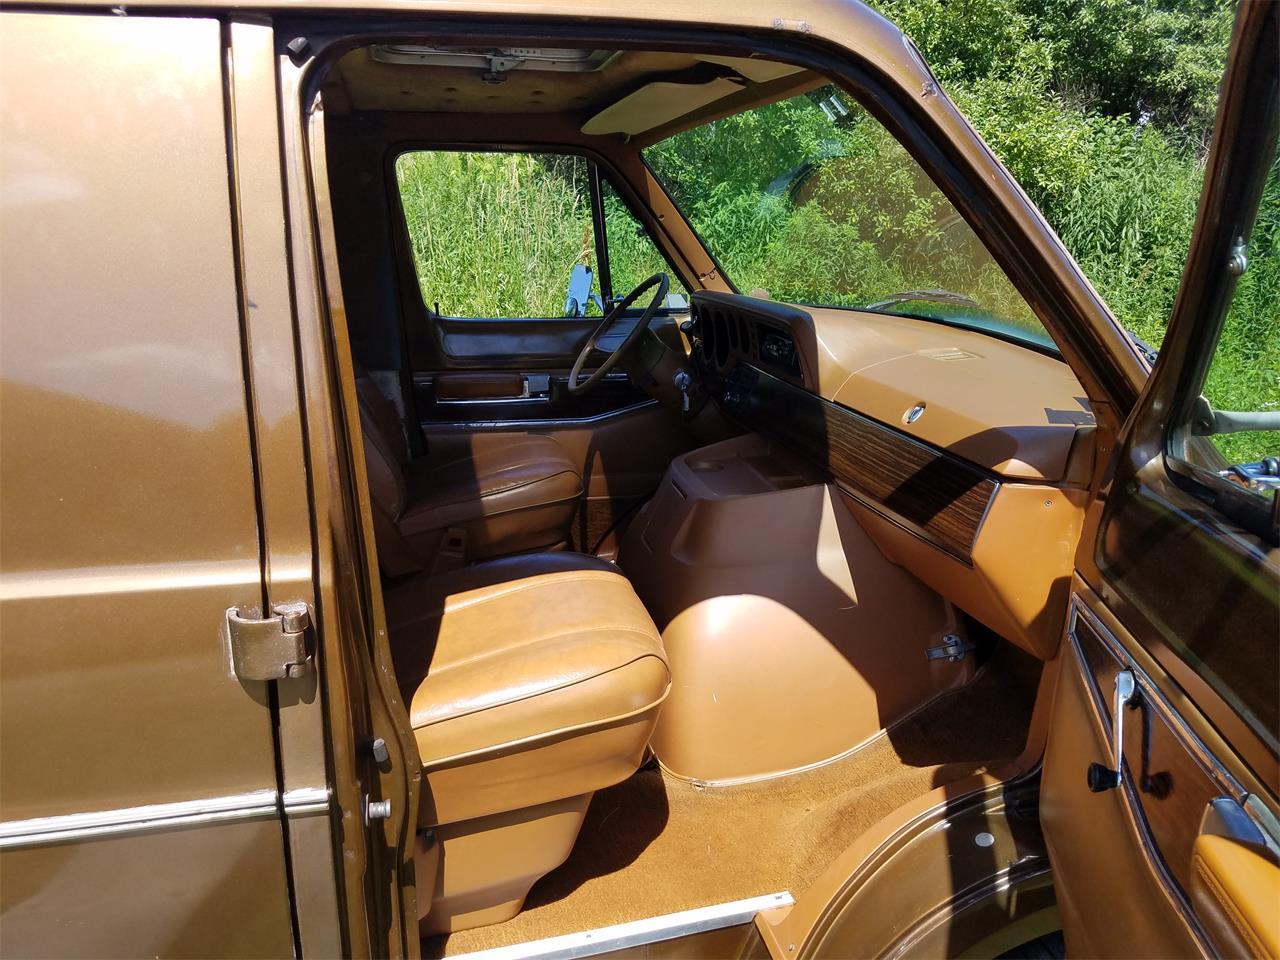 Large Picture of 1979 Dodge Van located in Woodstock Connecticut - QK08